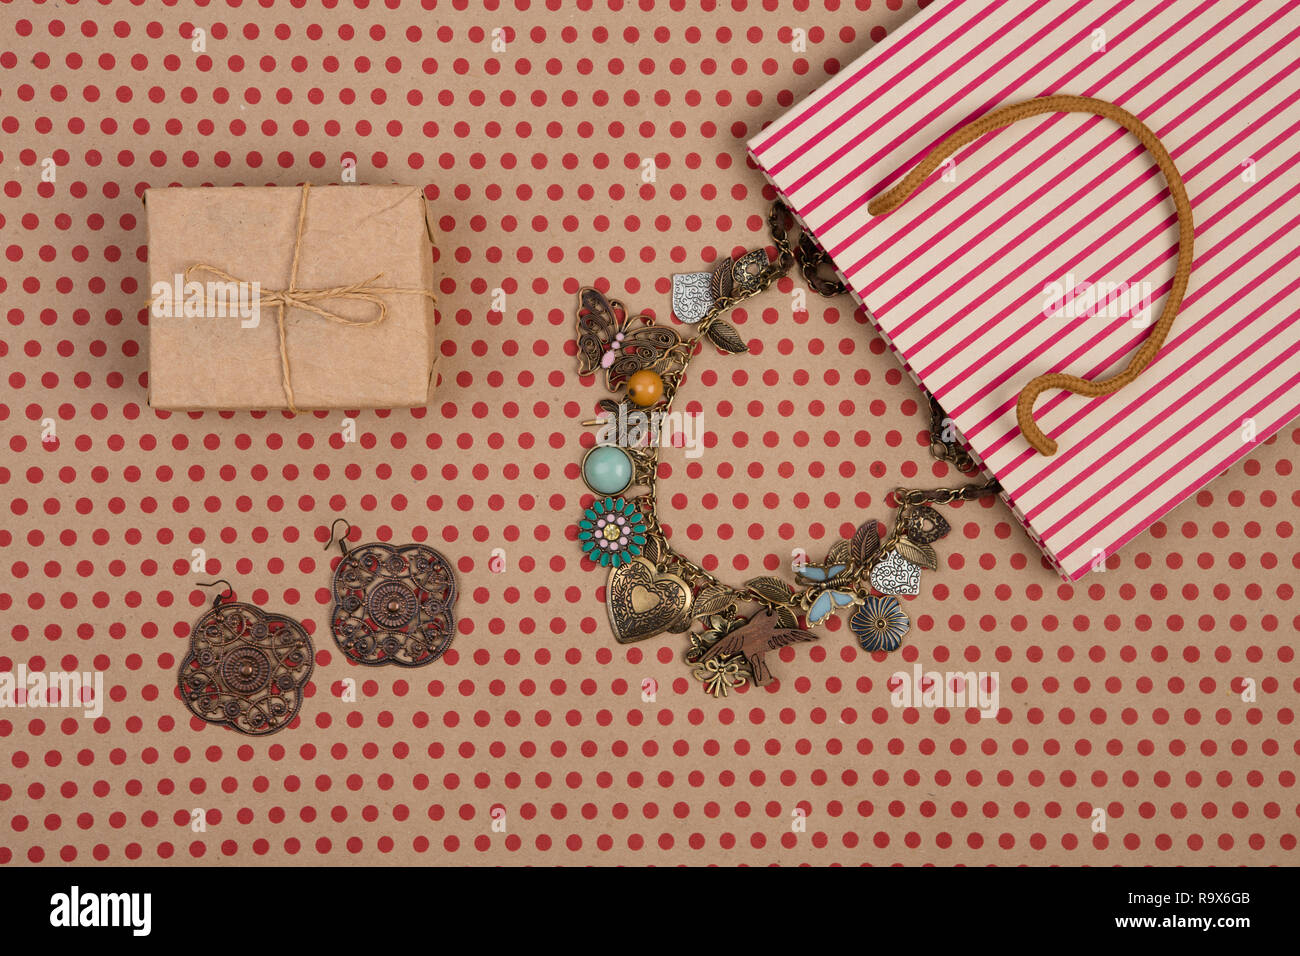 Celebratory Concept Handmade Striped Shopping Bag Of Craft Paper